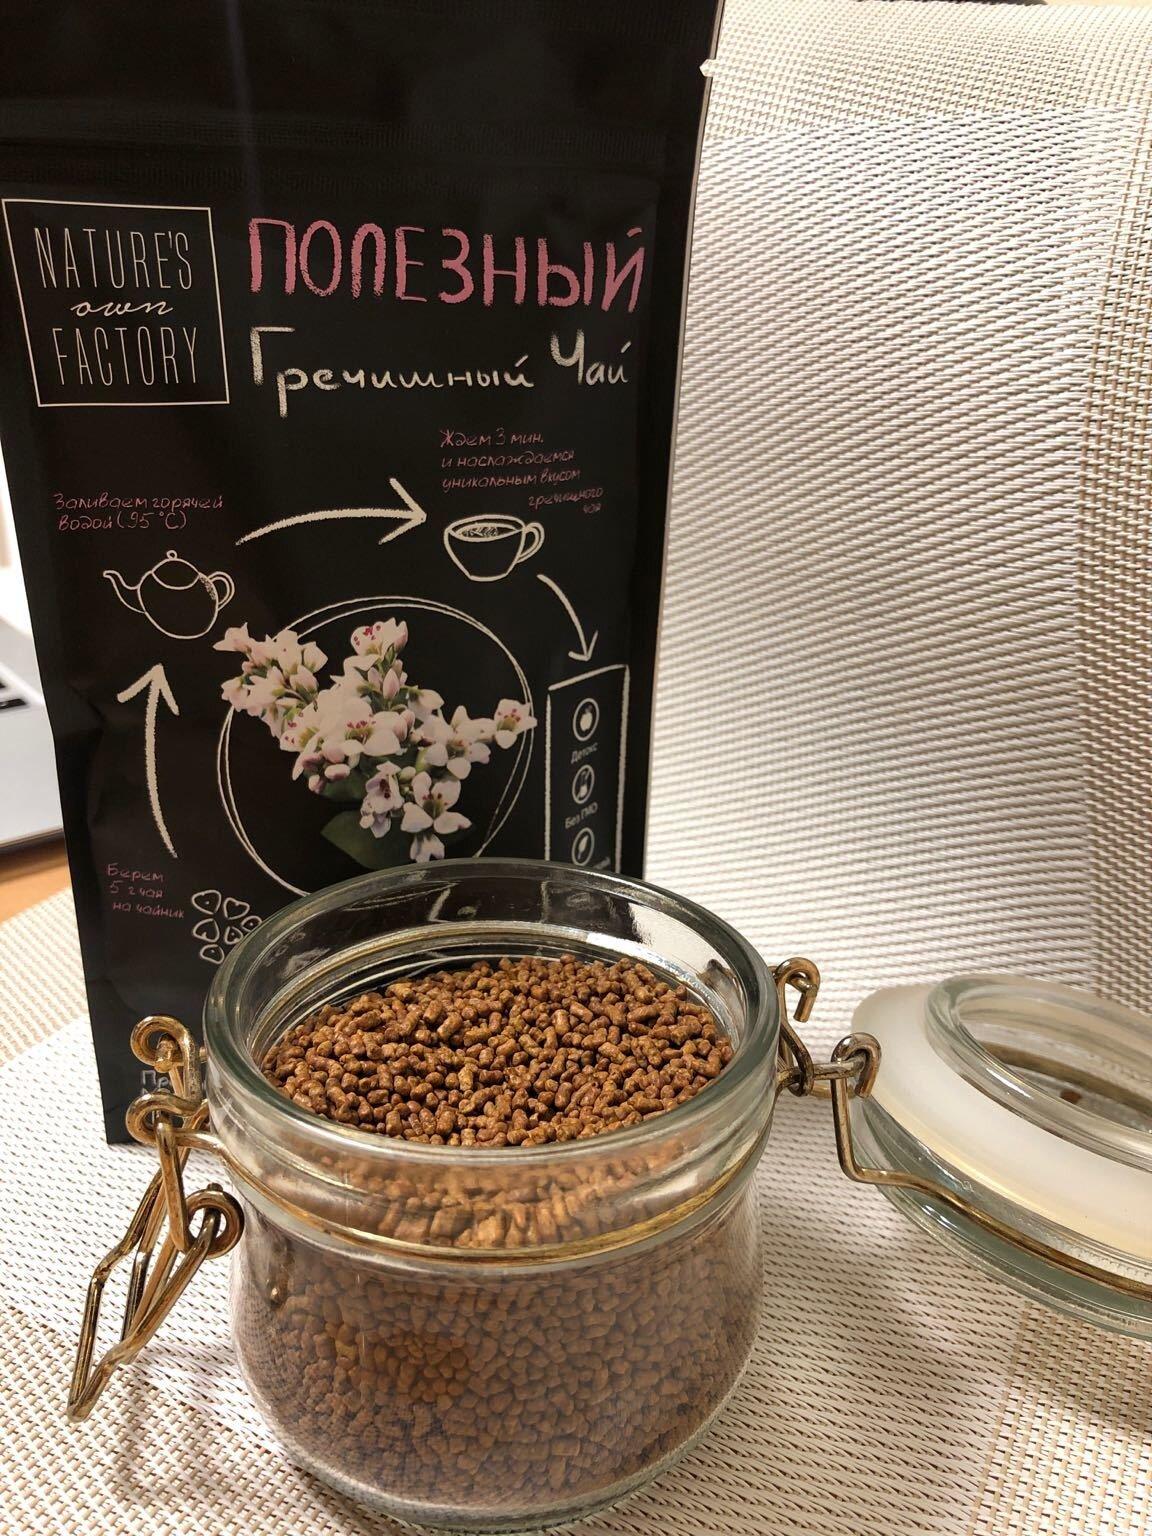 Напиток чайный гречишный Natures Own Factory, 30, 100 г - фото pic_2104e9e18362ceb35e67389e70035fd6_1920x9000_1.jpg